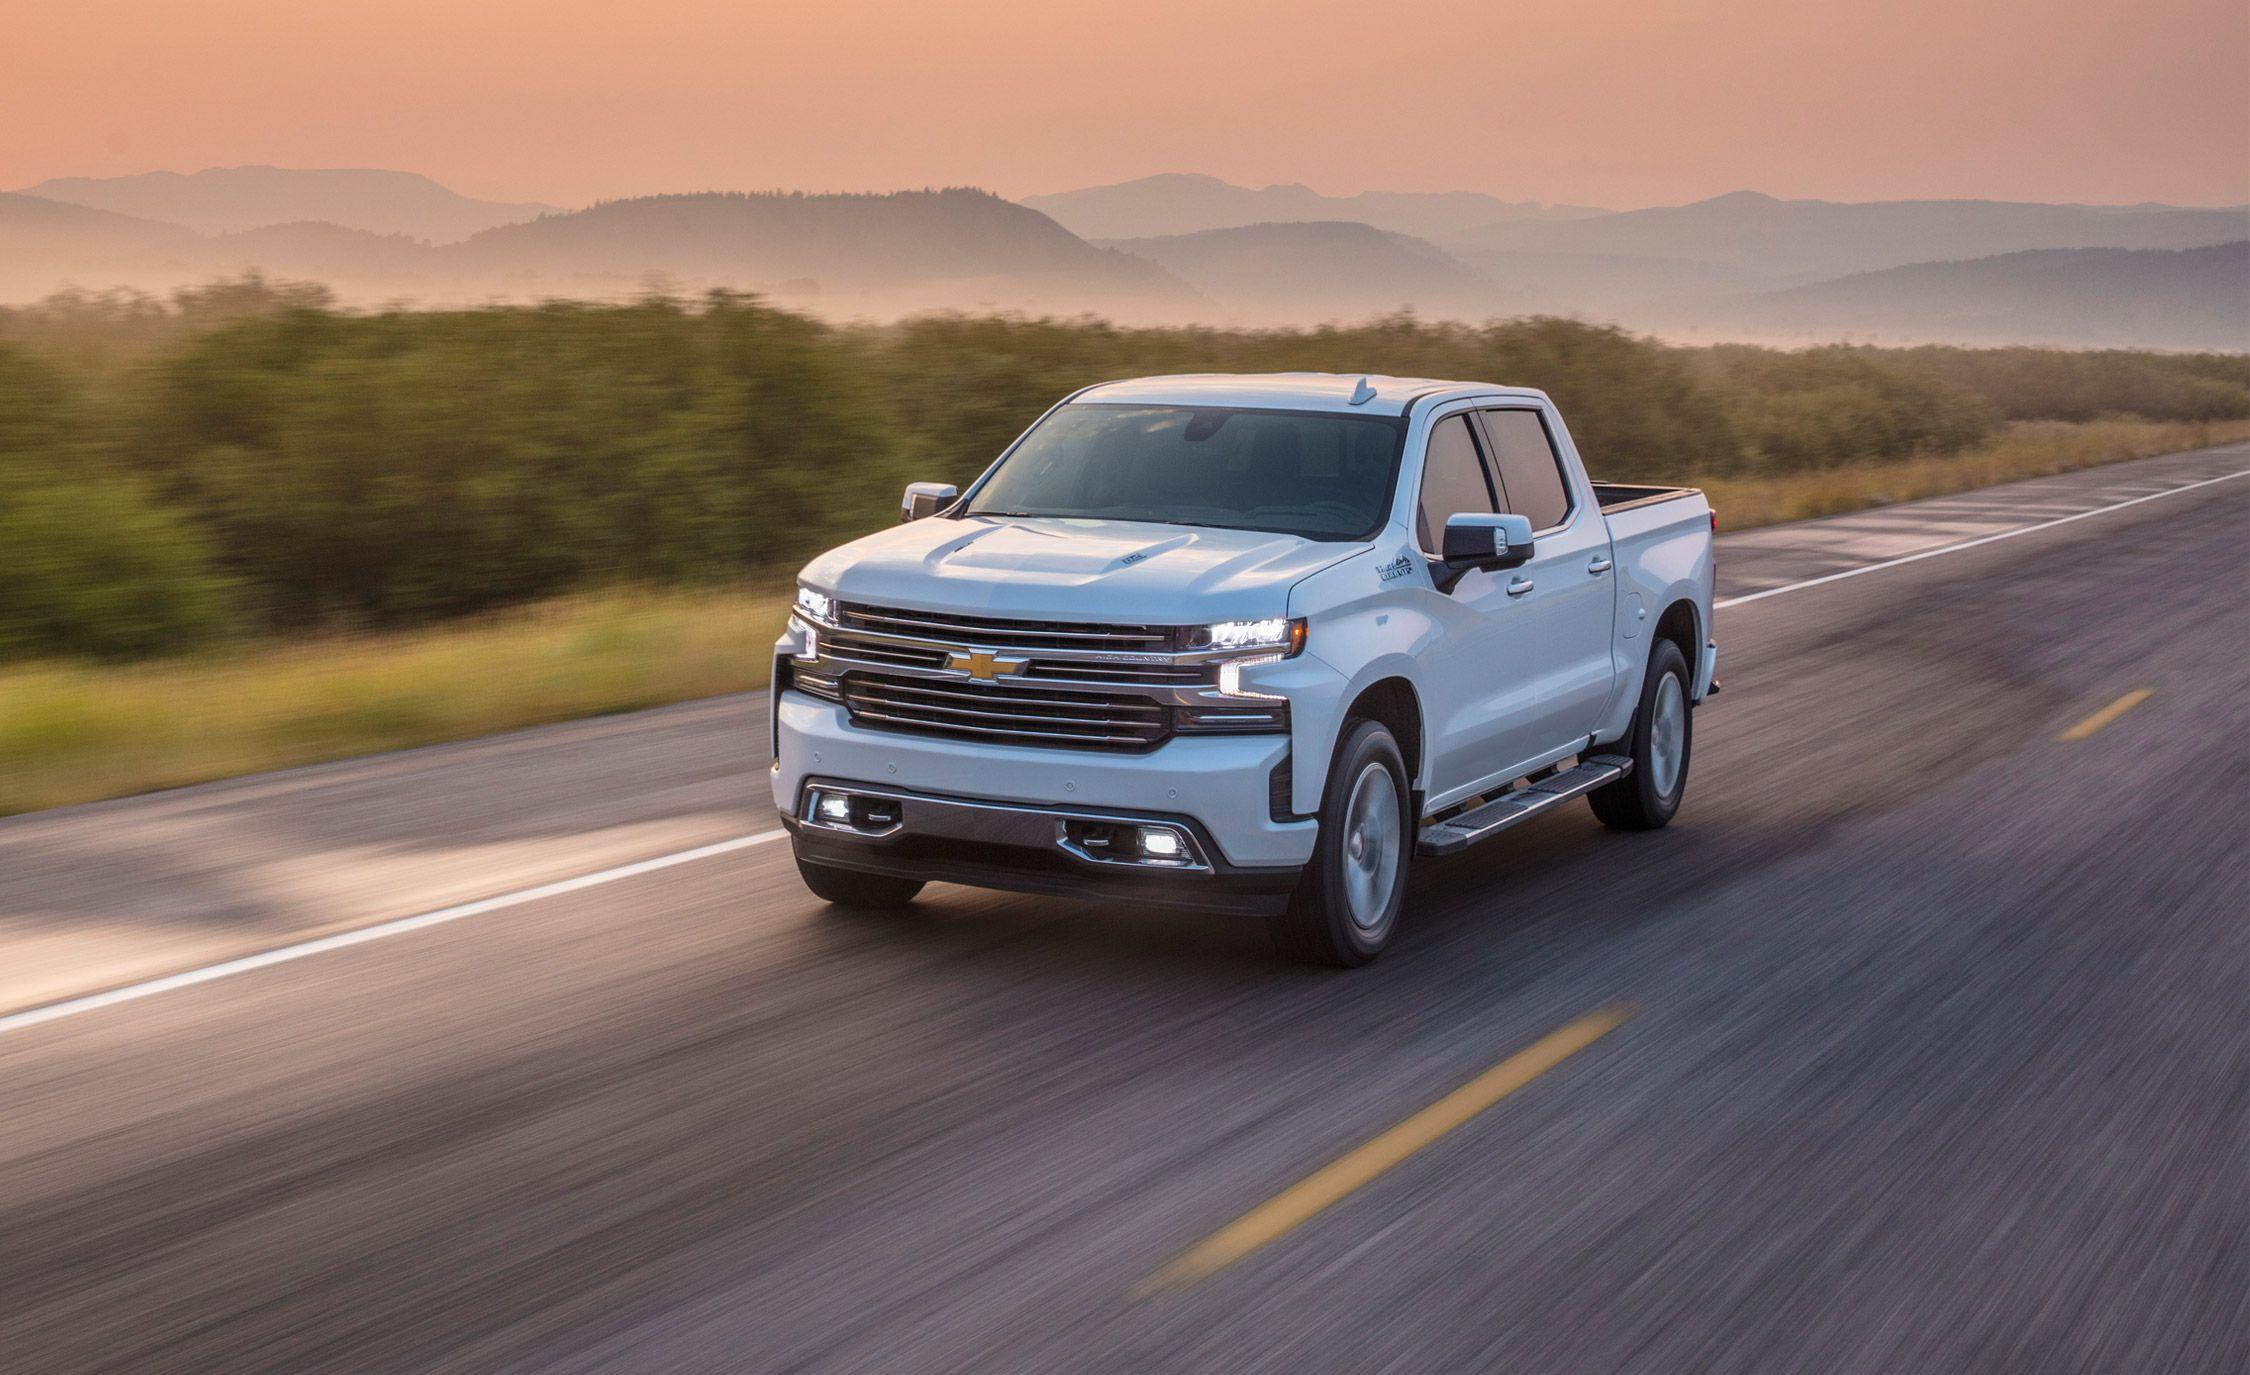 2019 Chevrolet Silverado 1500 Driven Longer Lighter More Fuel